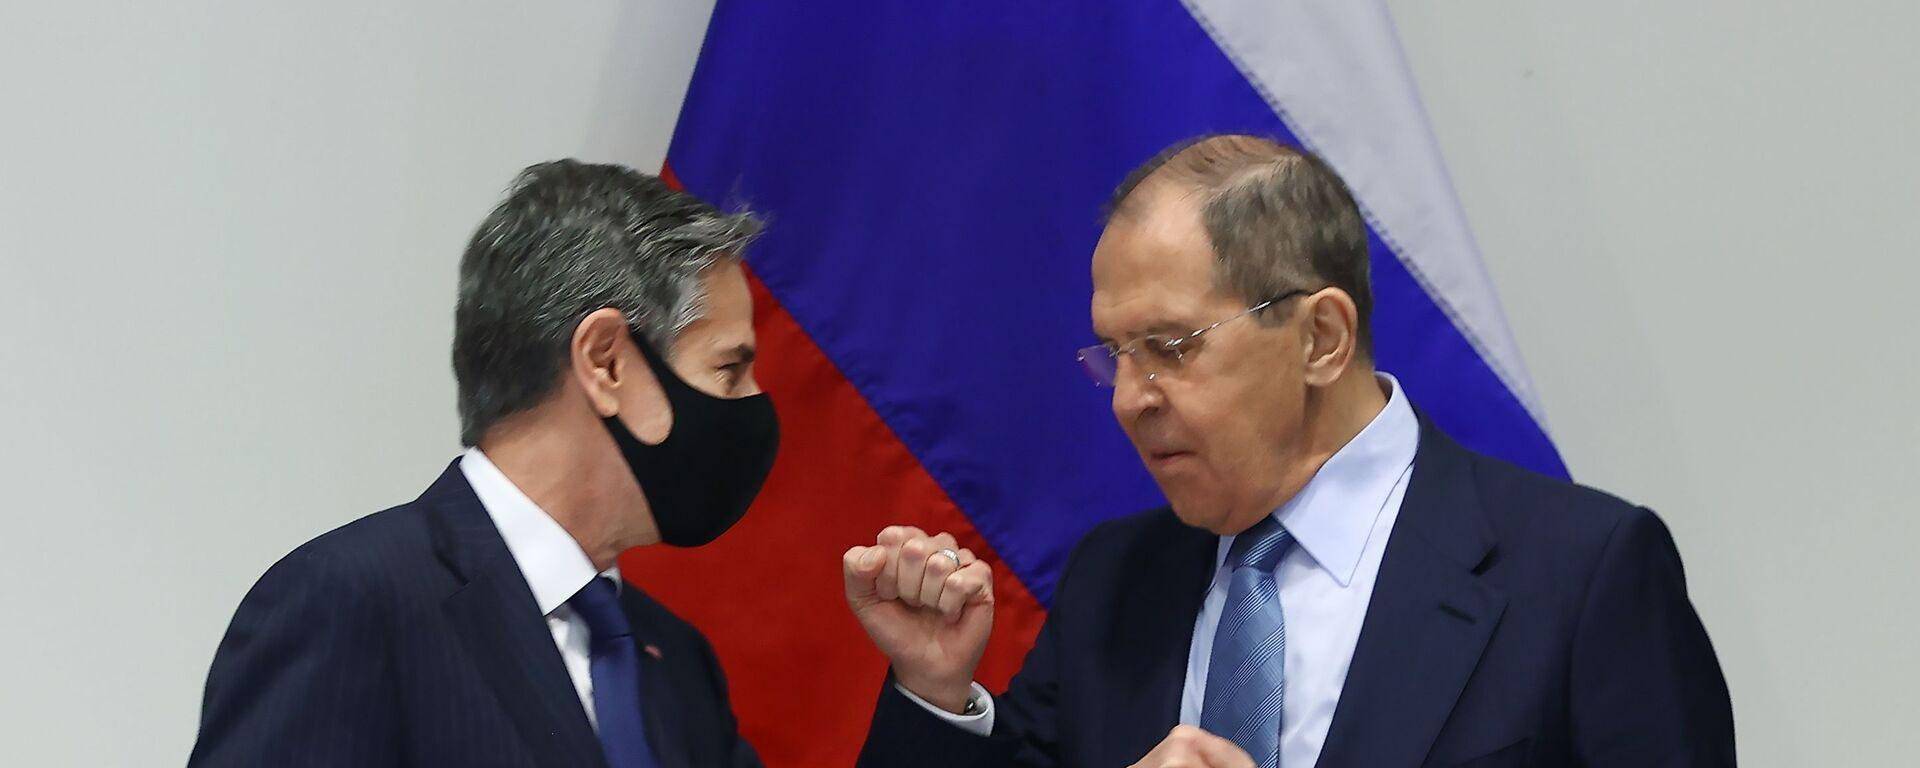 Ministři zahraničí Ruska a USA - Sergej Lavrov a Antony Blinken - Sputnik Česká republika, 1920, 20.05.2021